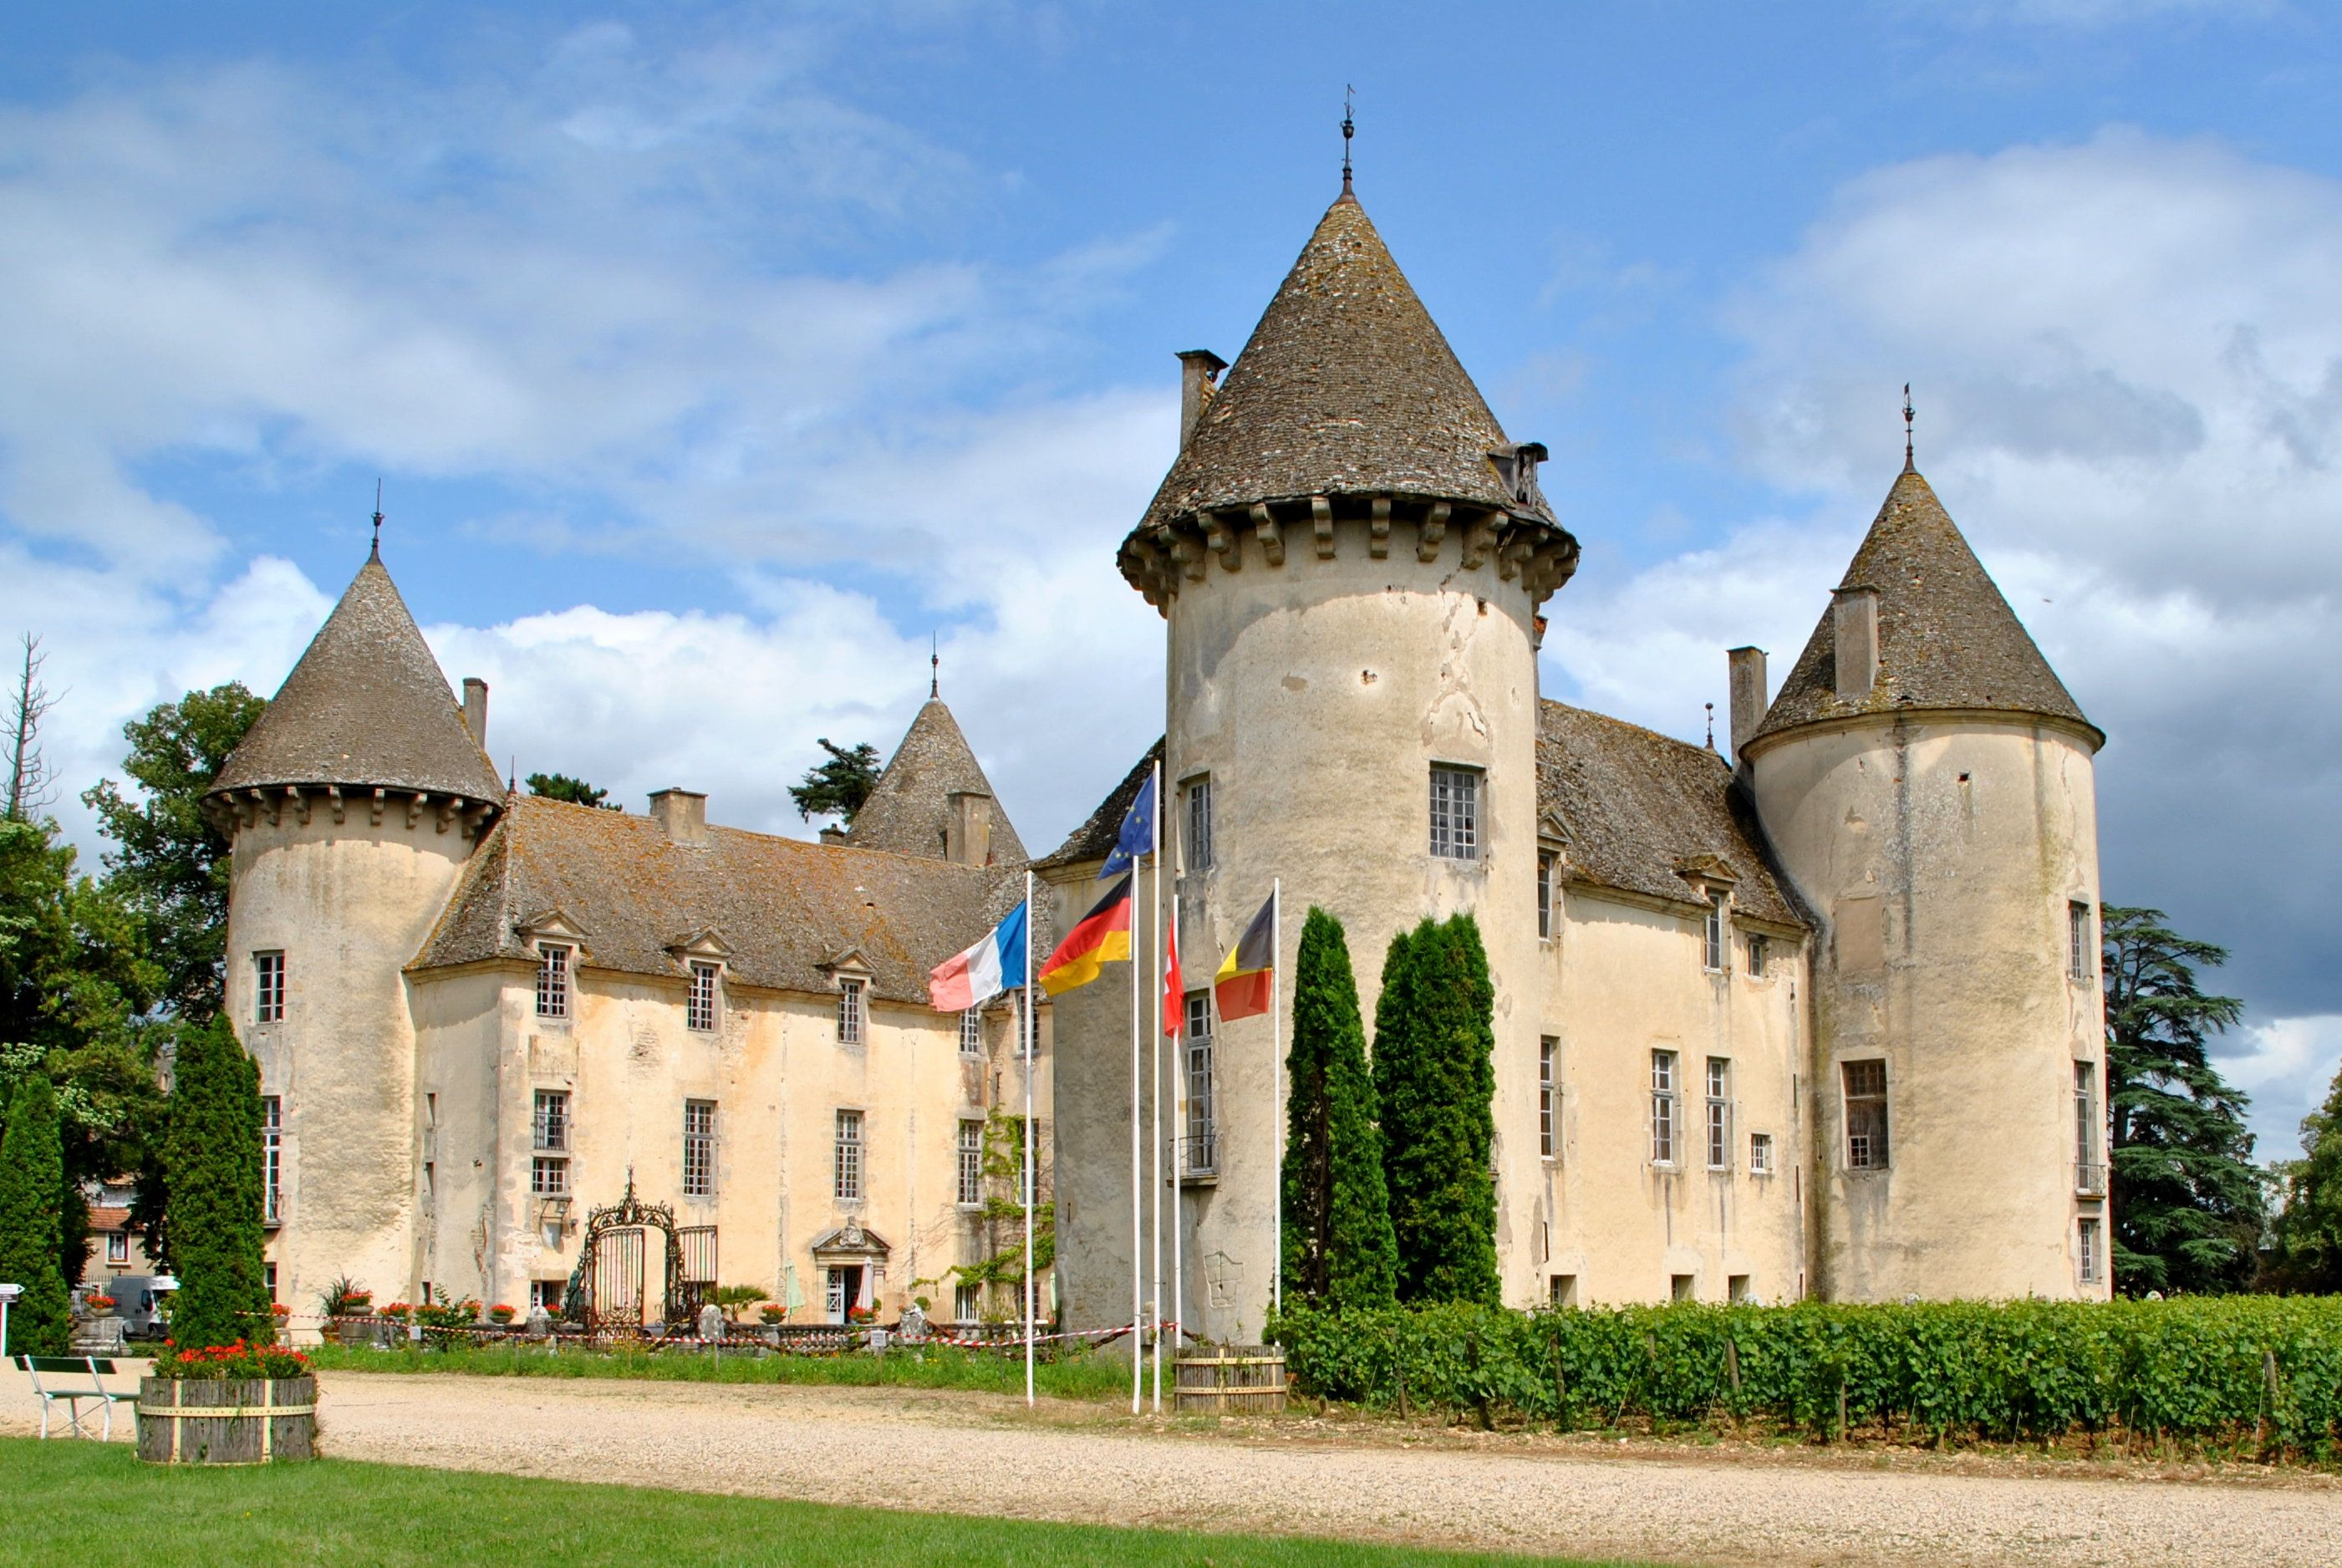 ch teau de savigny l s beaune bourgogne travel scenic photos pinterest castles france. Black Bedroom Furniture Sets. Home Design Ideas